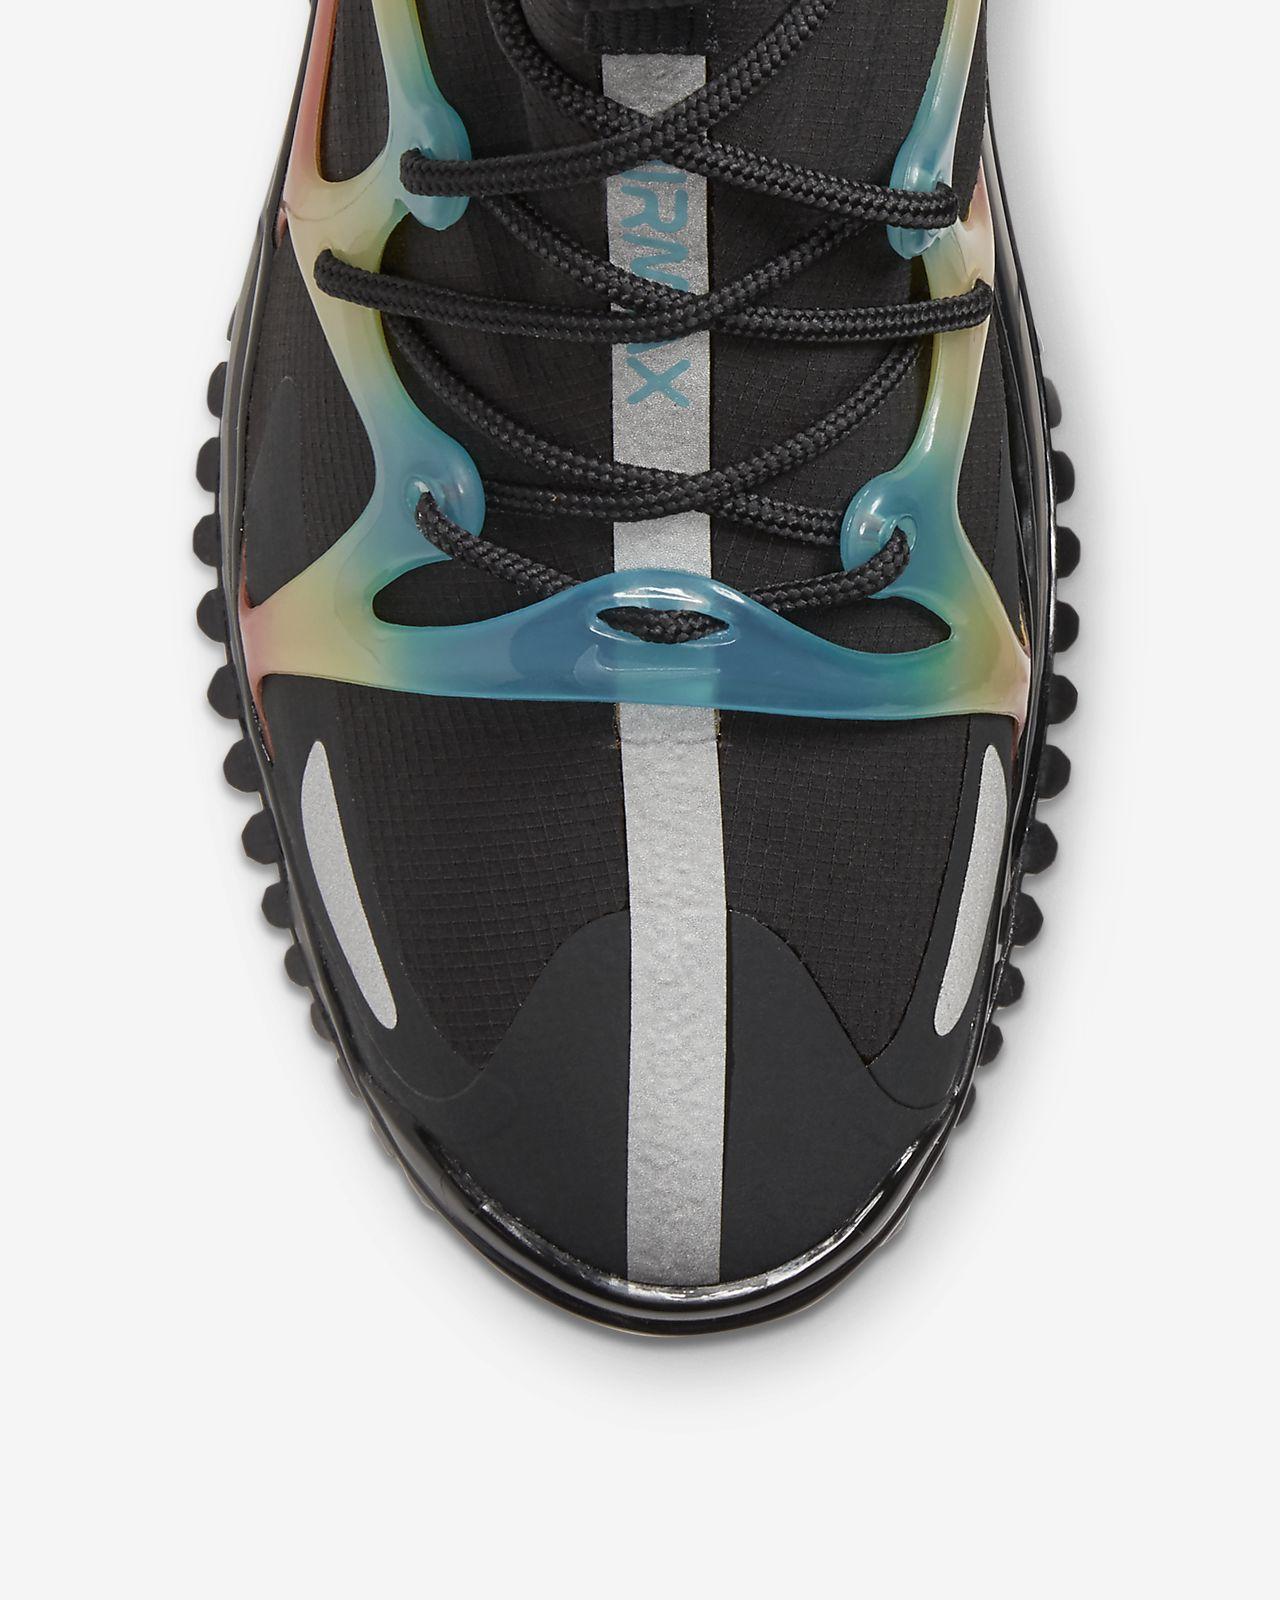 Nike Air Max 720 Horizon: Release Date & Price